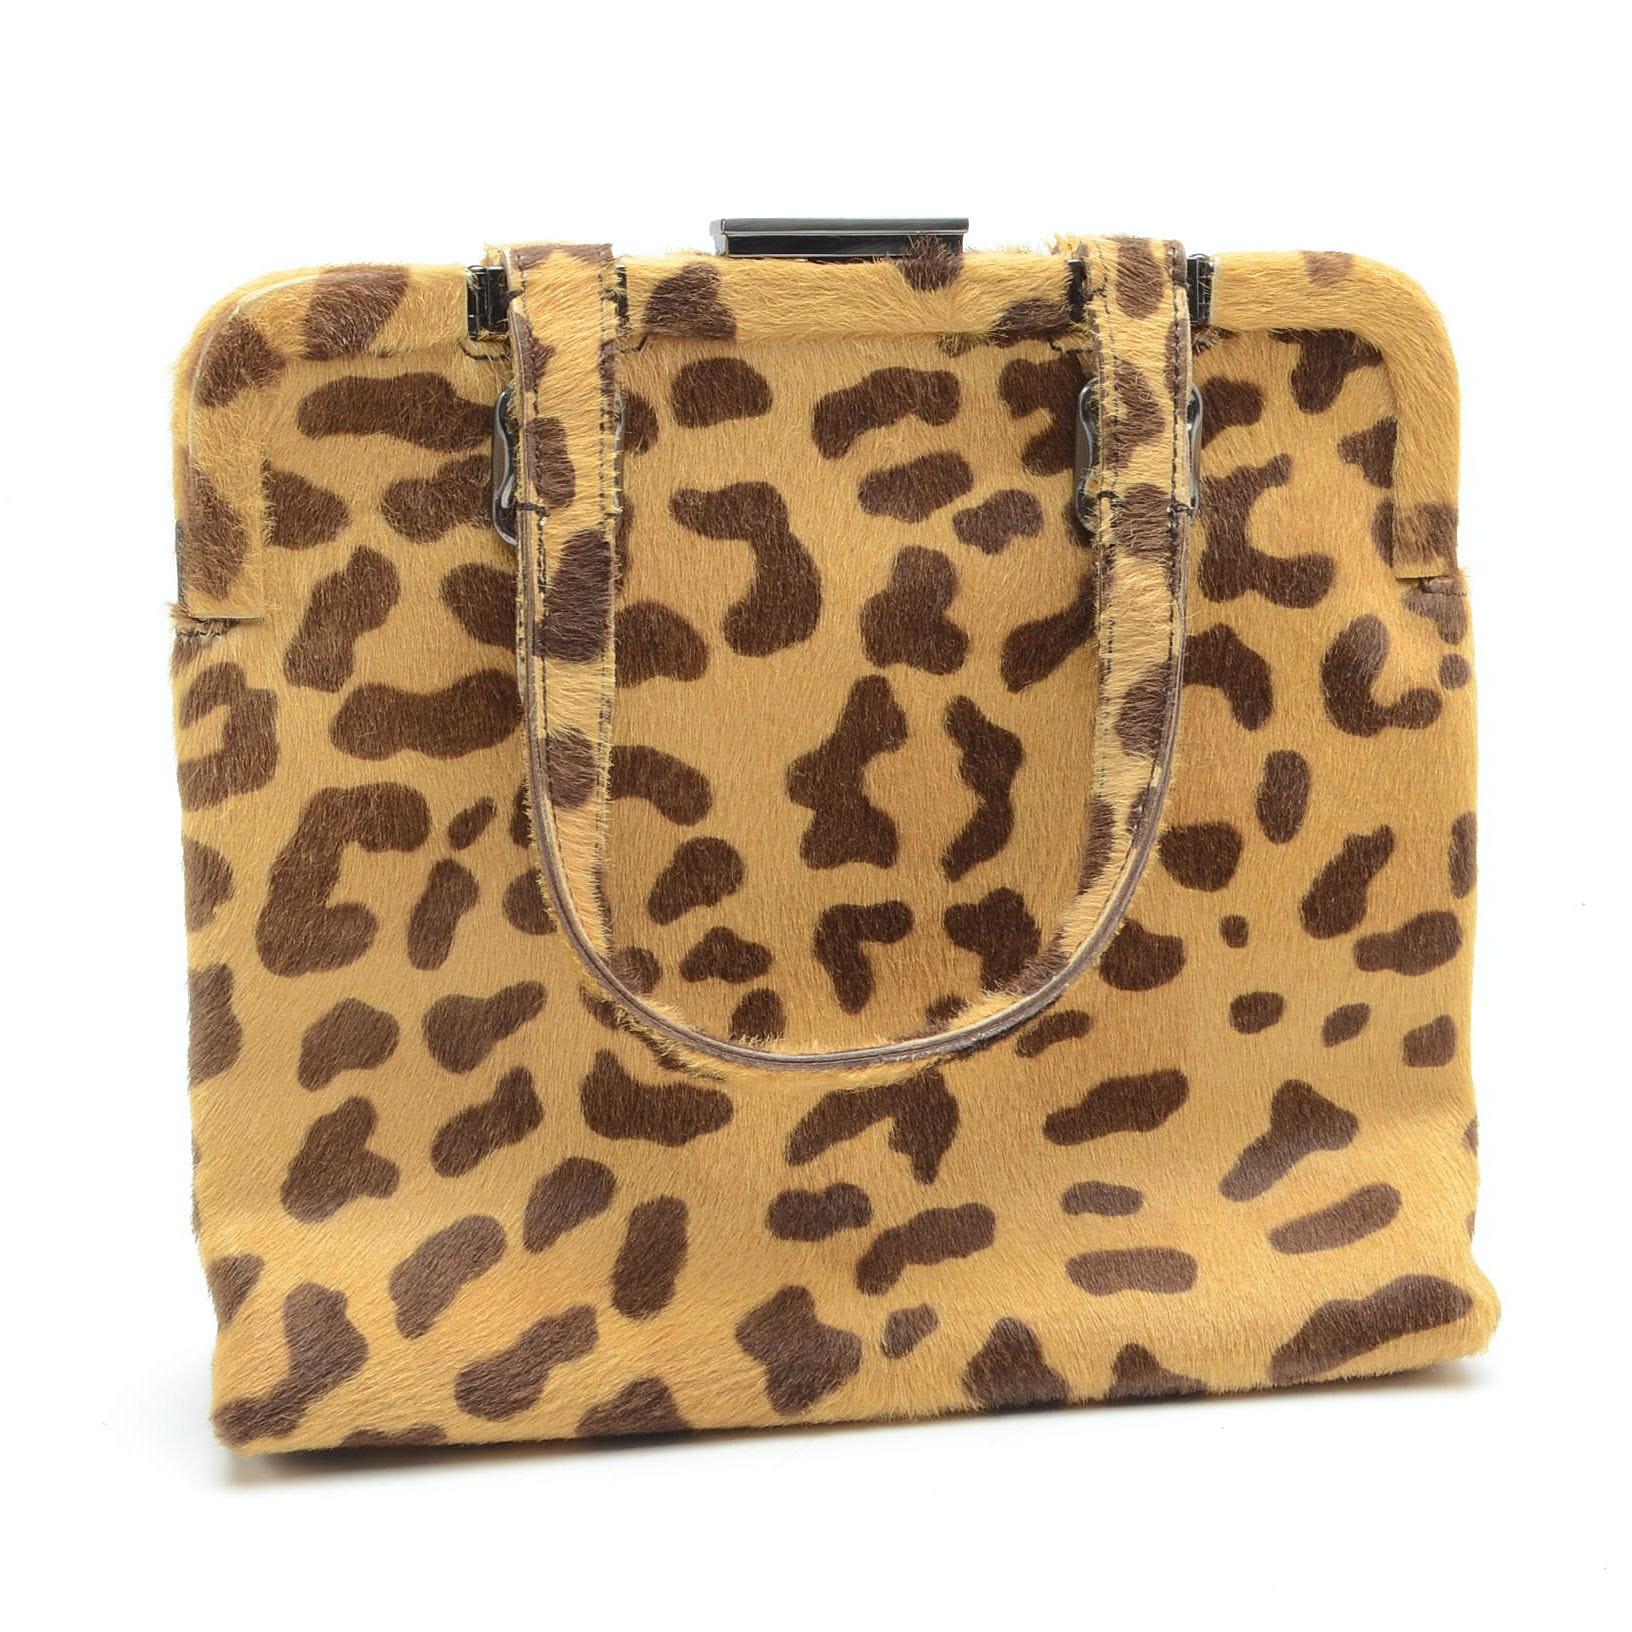 Prada Leopard Print Calfhair Handbag